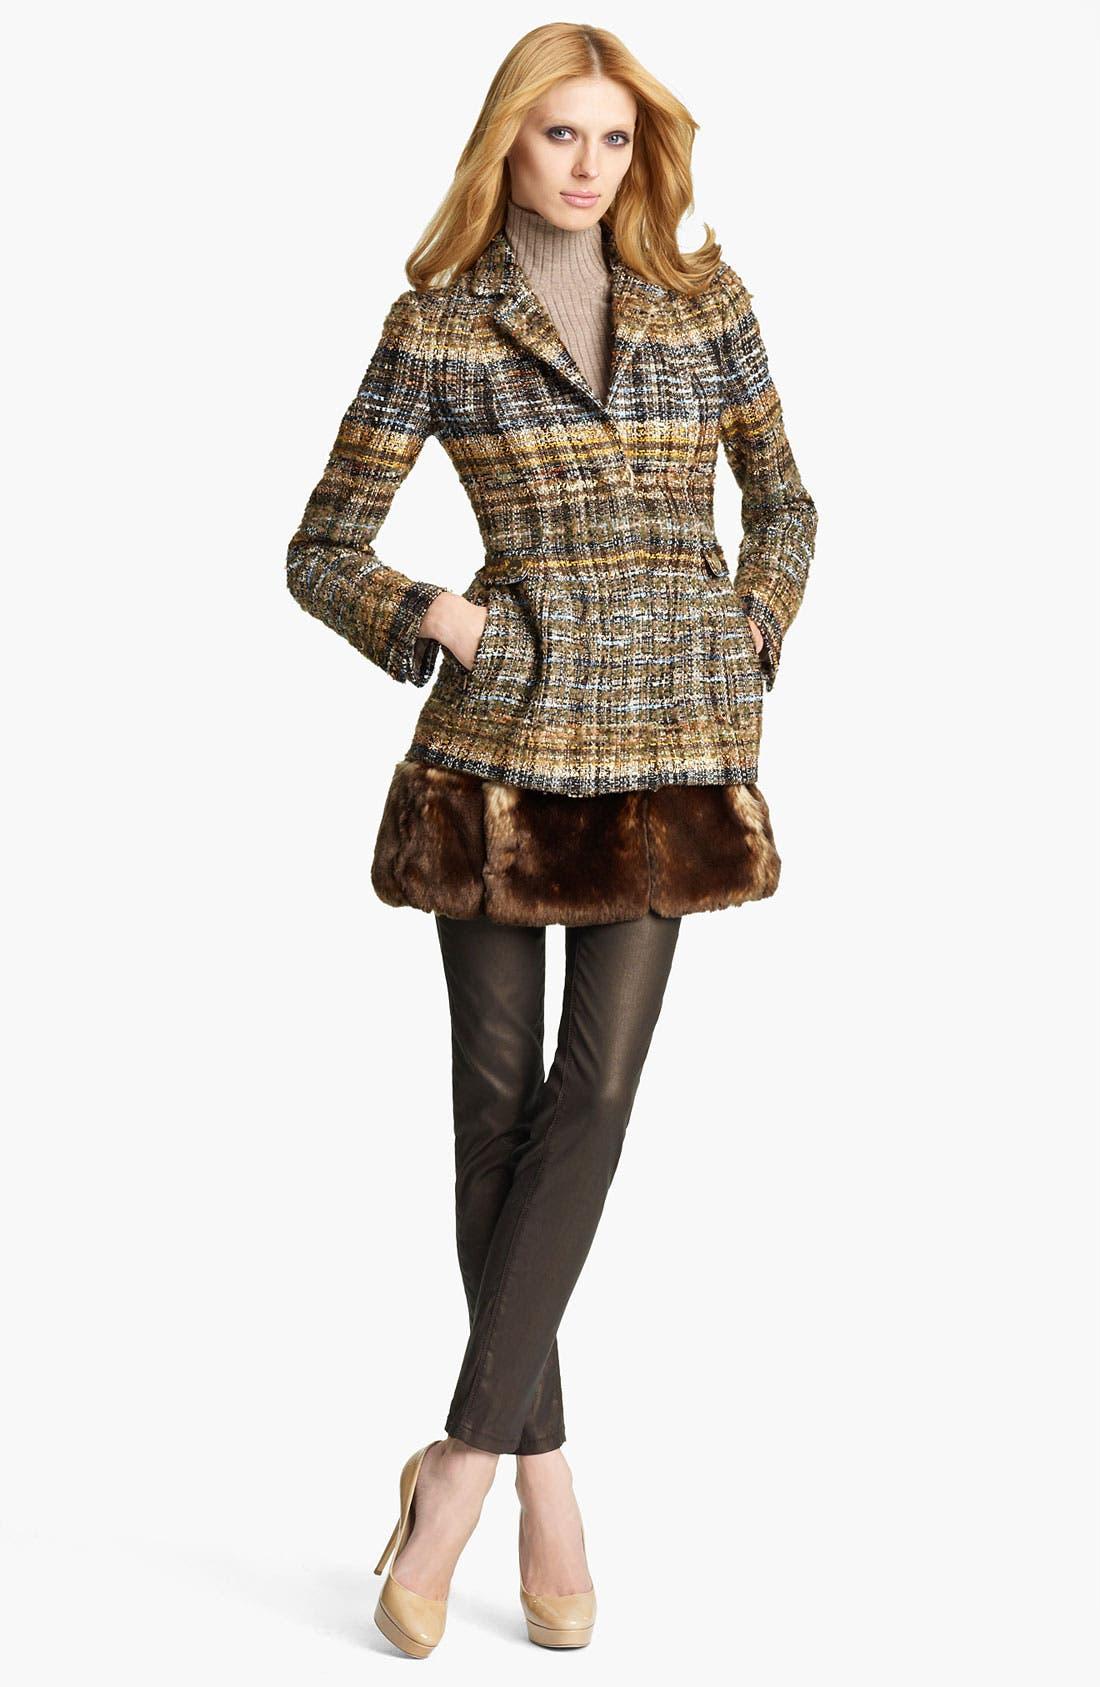 Alternate Image 1 Selected - Blumarine Tweed Coat with Removable Faux Fur Hem